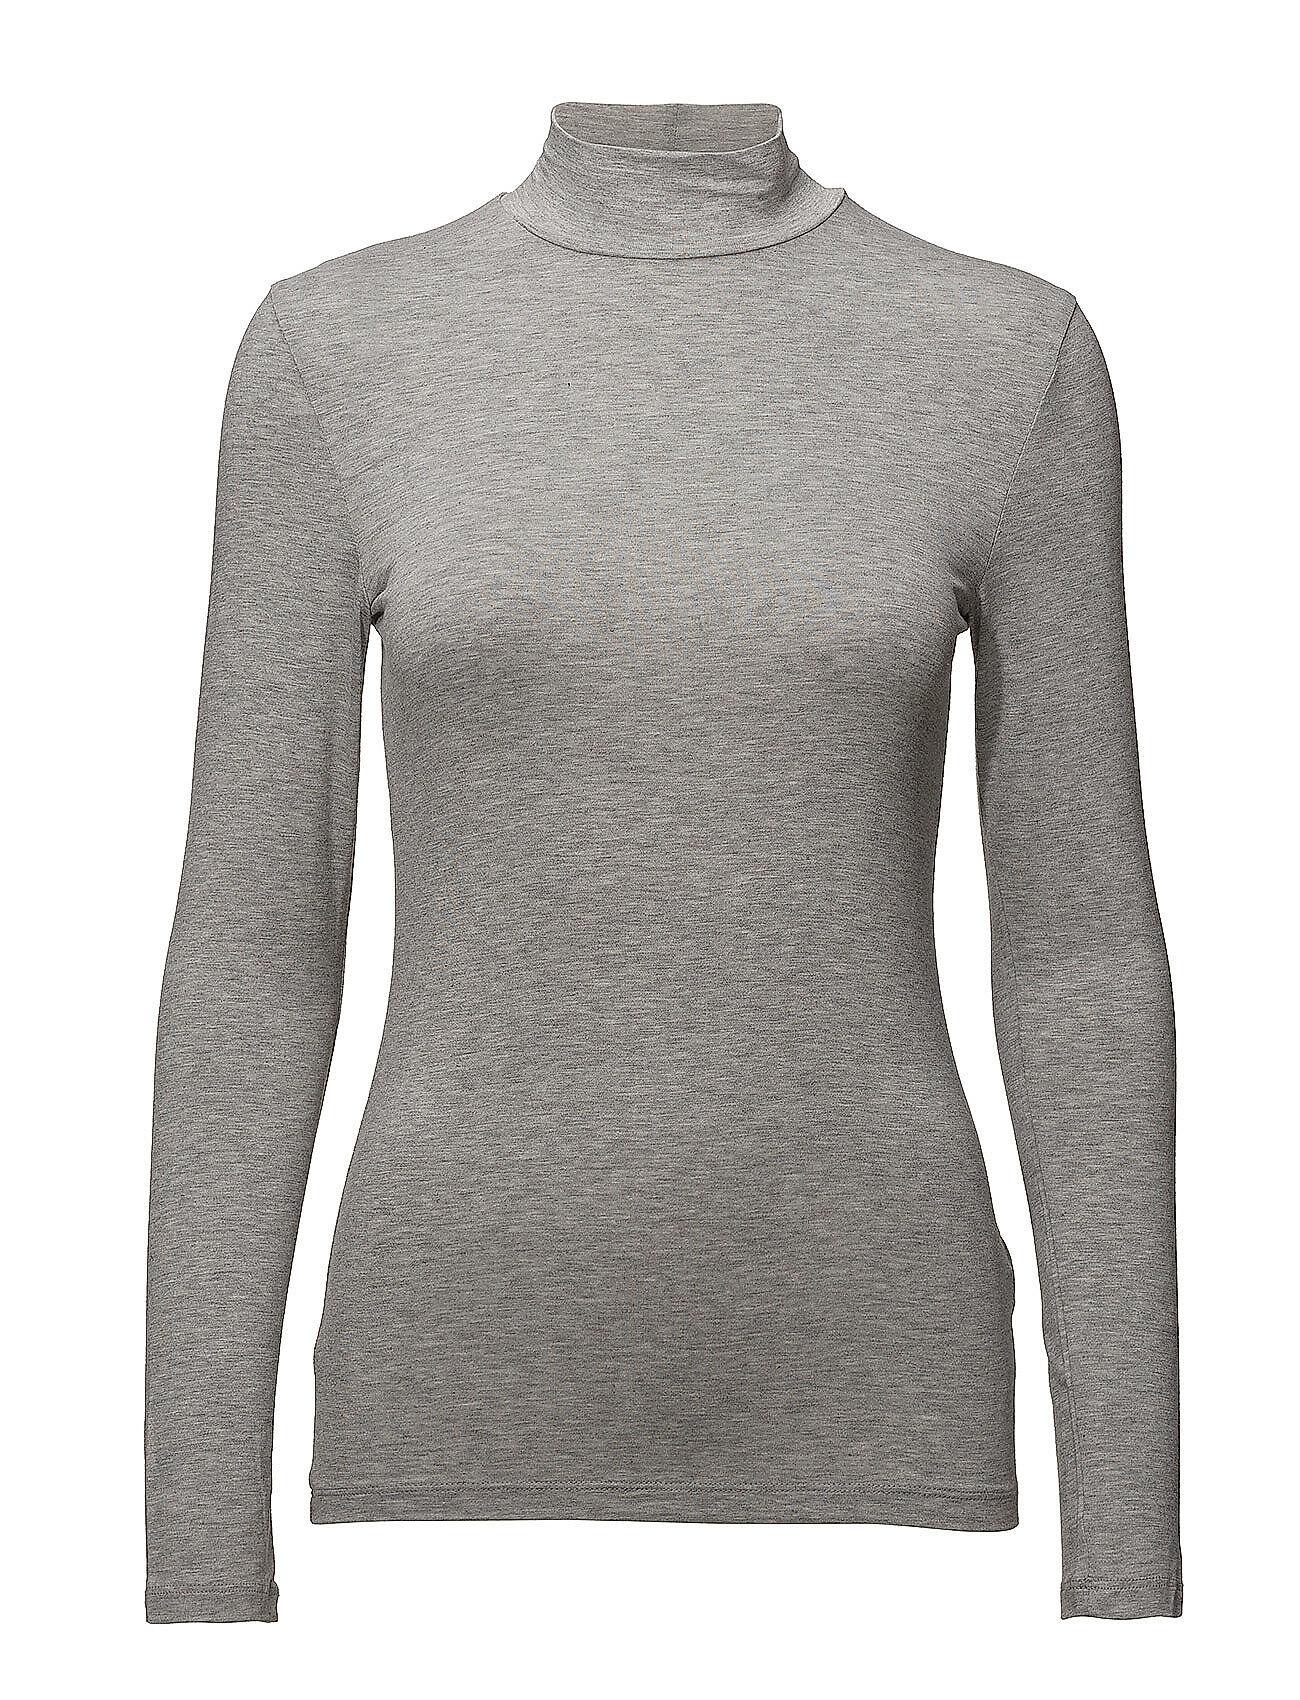 Selected Femme Slfmio Ls Highneck B - Noos T-shirts & Tops Long-sleeved Harmaa Selected Femme